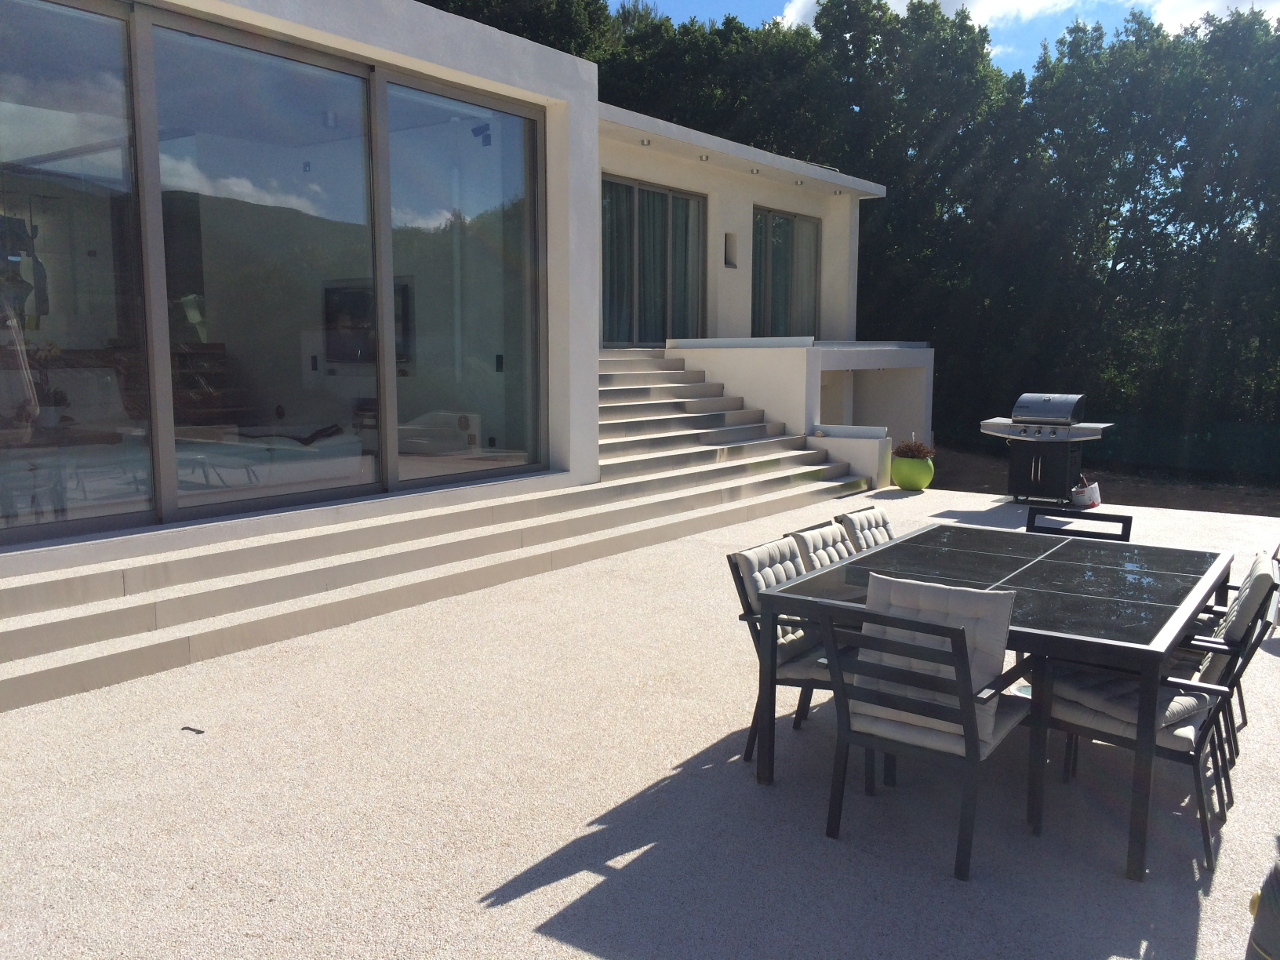 particulier marbre r sine drainant sols techniques. Black Bedroom Furniture Sets. Home Design Ideas